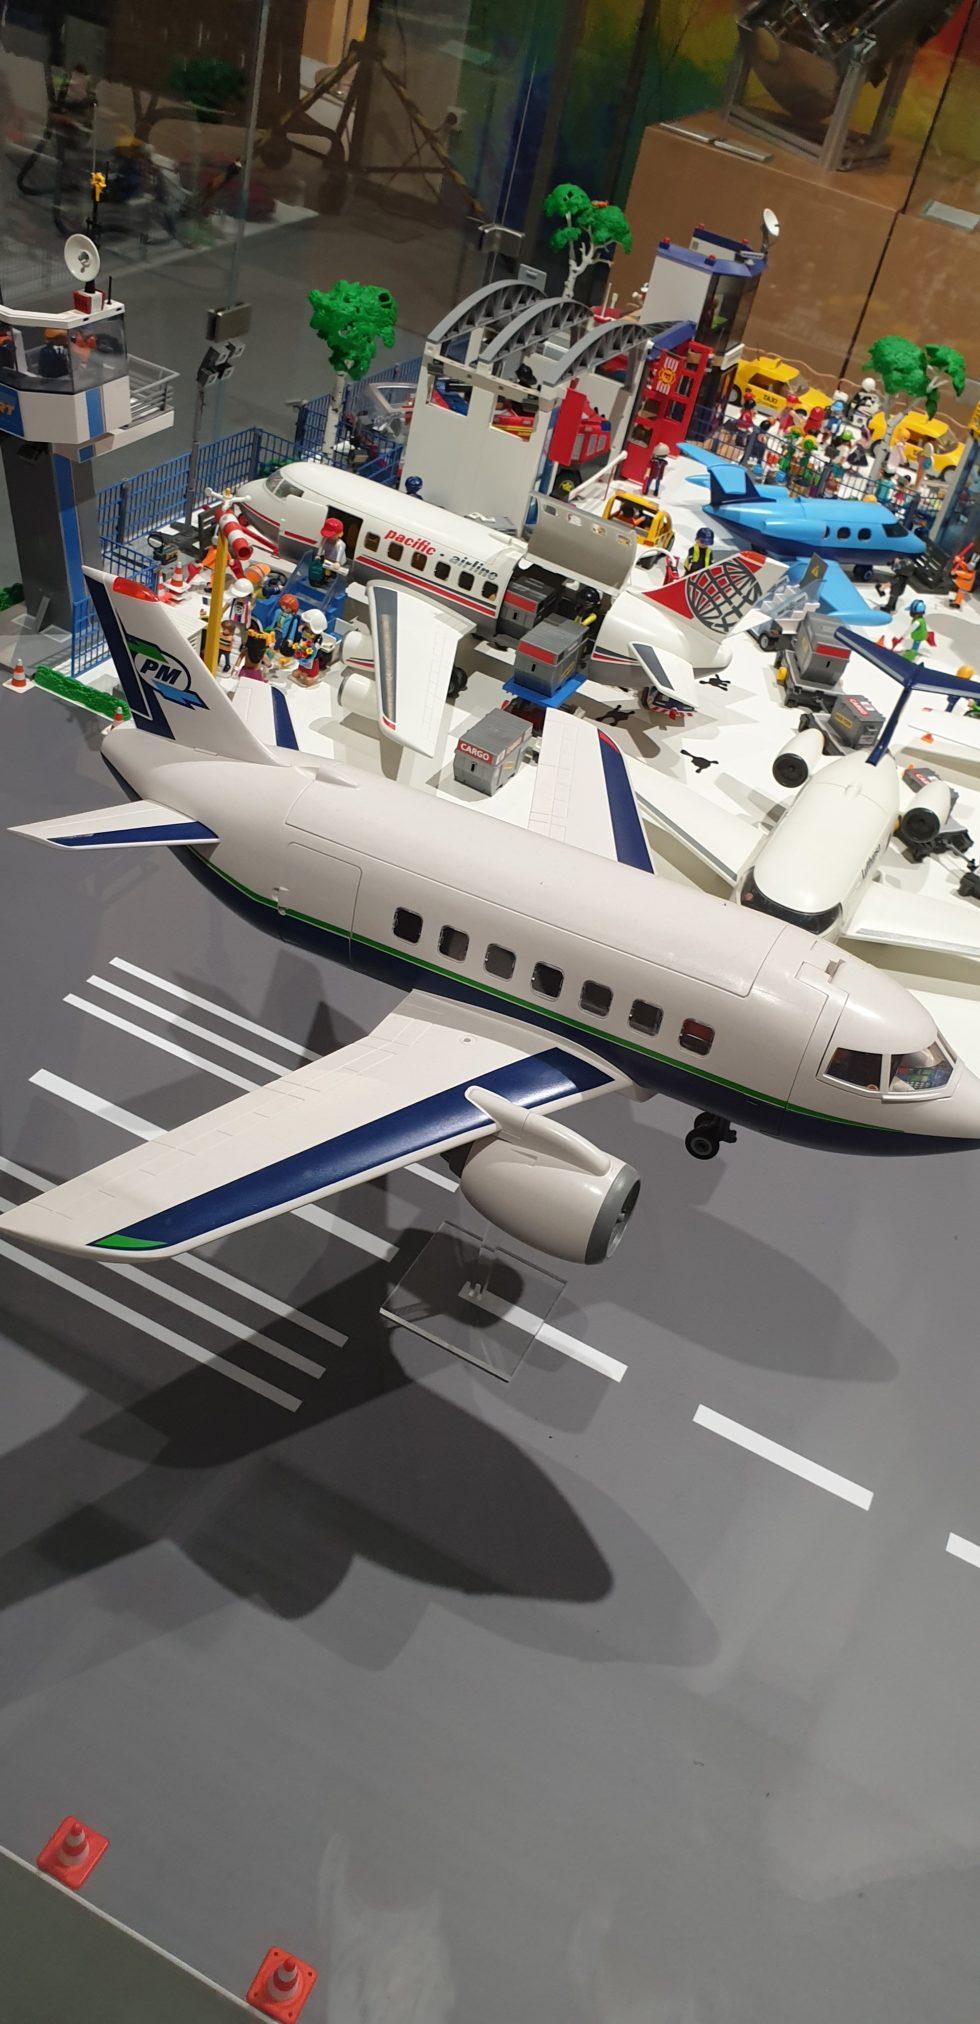 Flugzeug aus Playmobil